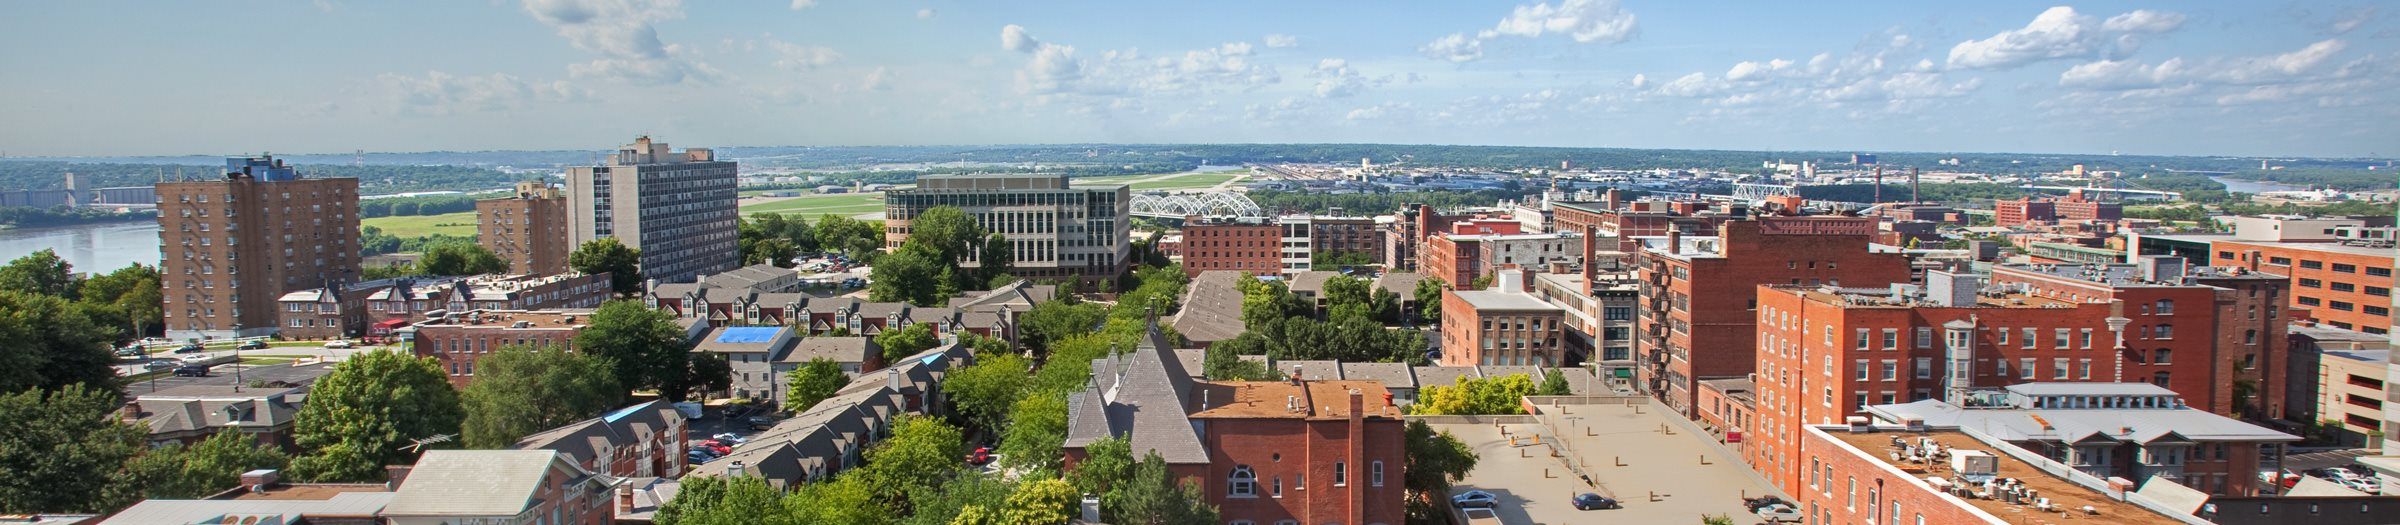 Aerial view of Quality Hill Square-Quality Hill Square, Kansas City, MO